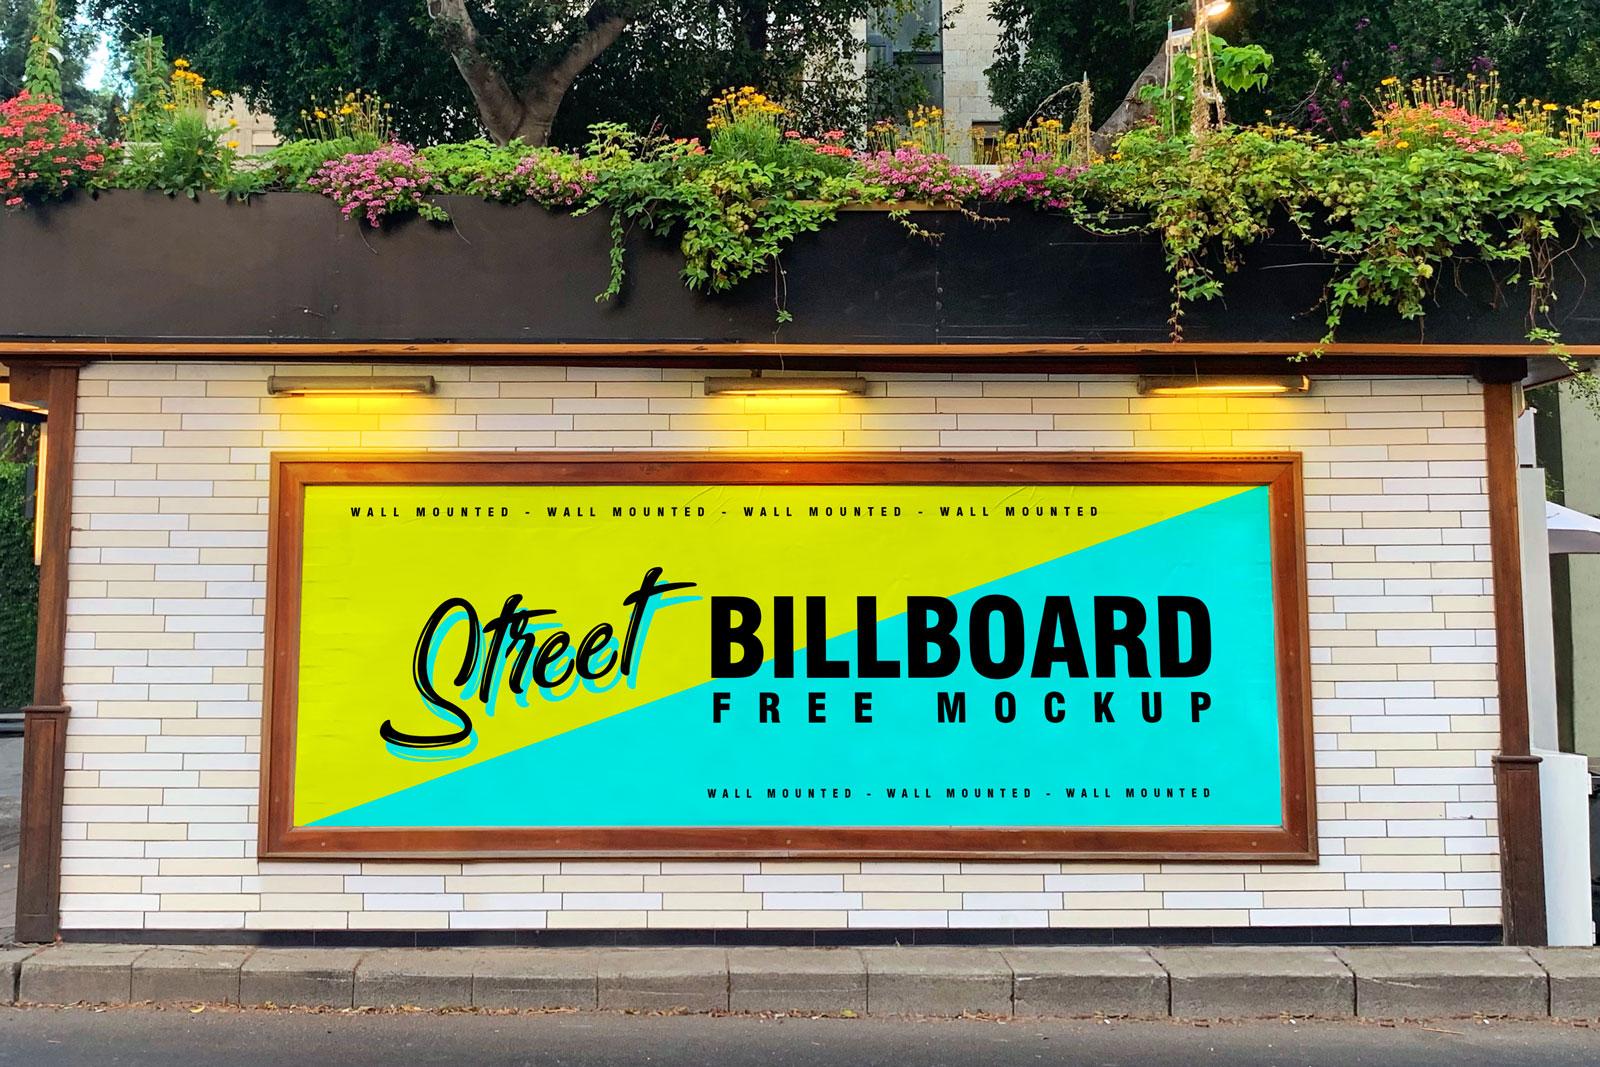 Free-Street-Wall-Mounted-Billboard-Mockup-PSD